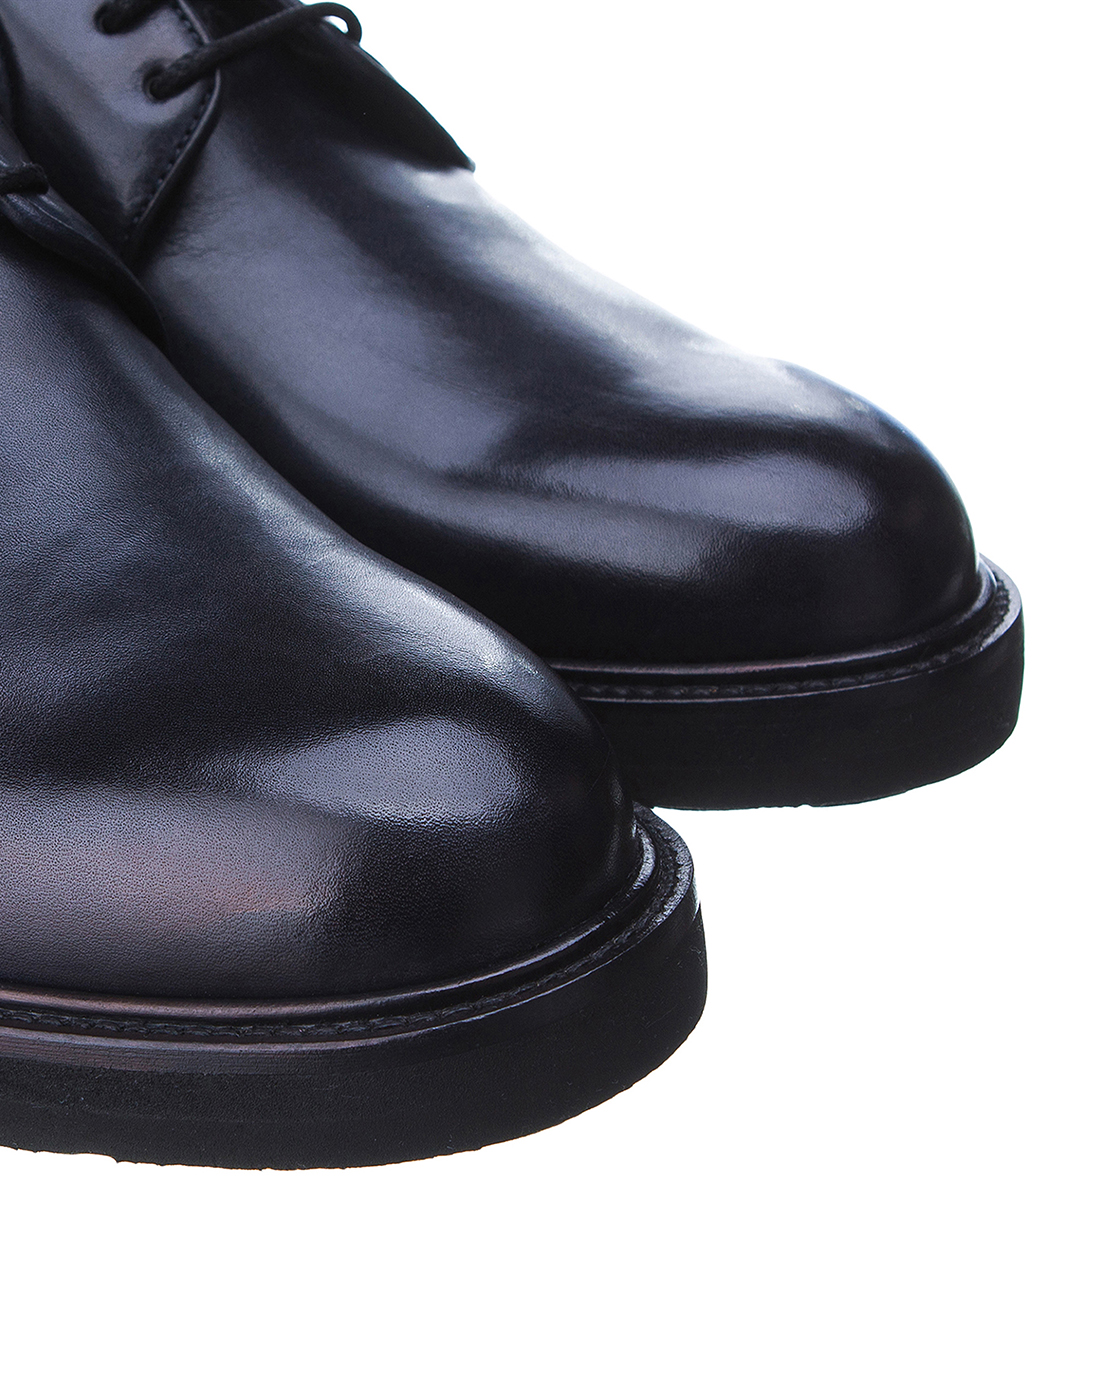 Туфли синие мужские Brecos S8066-4